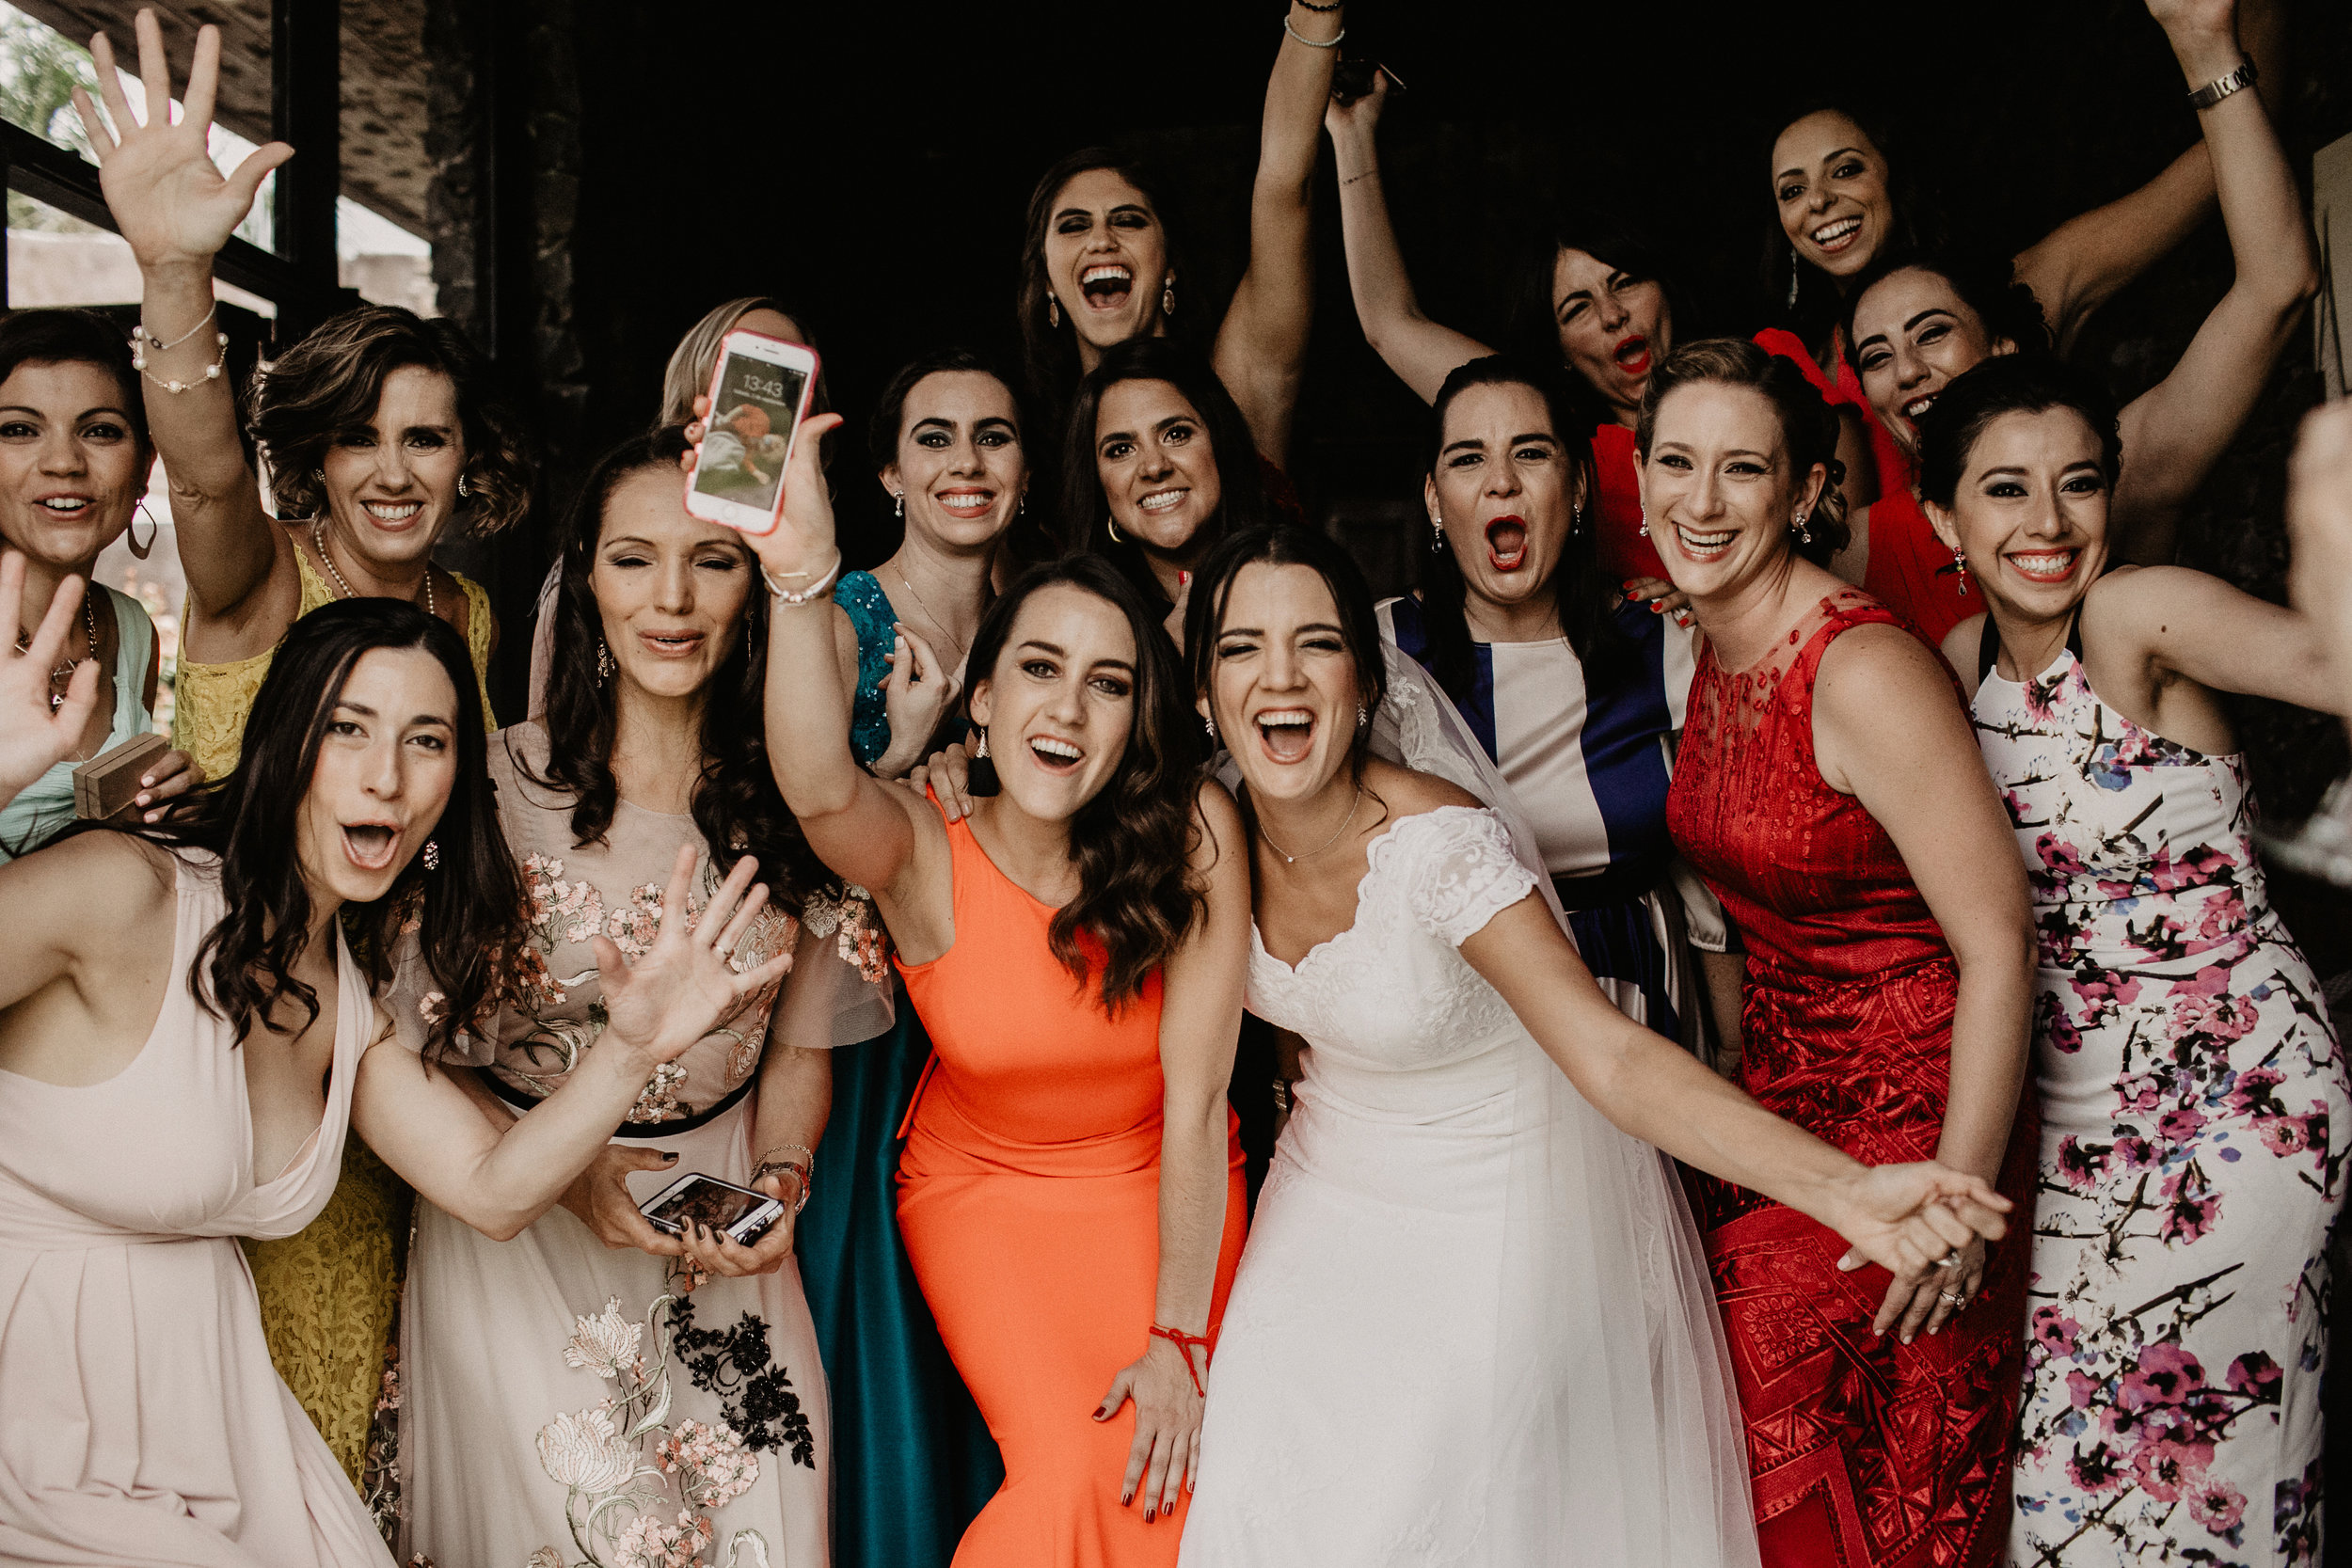 alfonso_flores_destination_wedding_photographer_pau_alonso_214.JPG